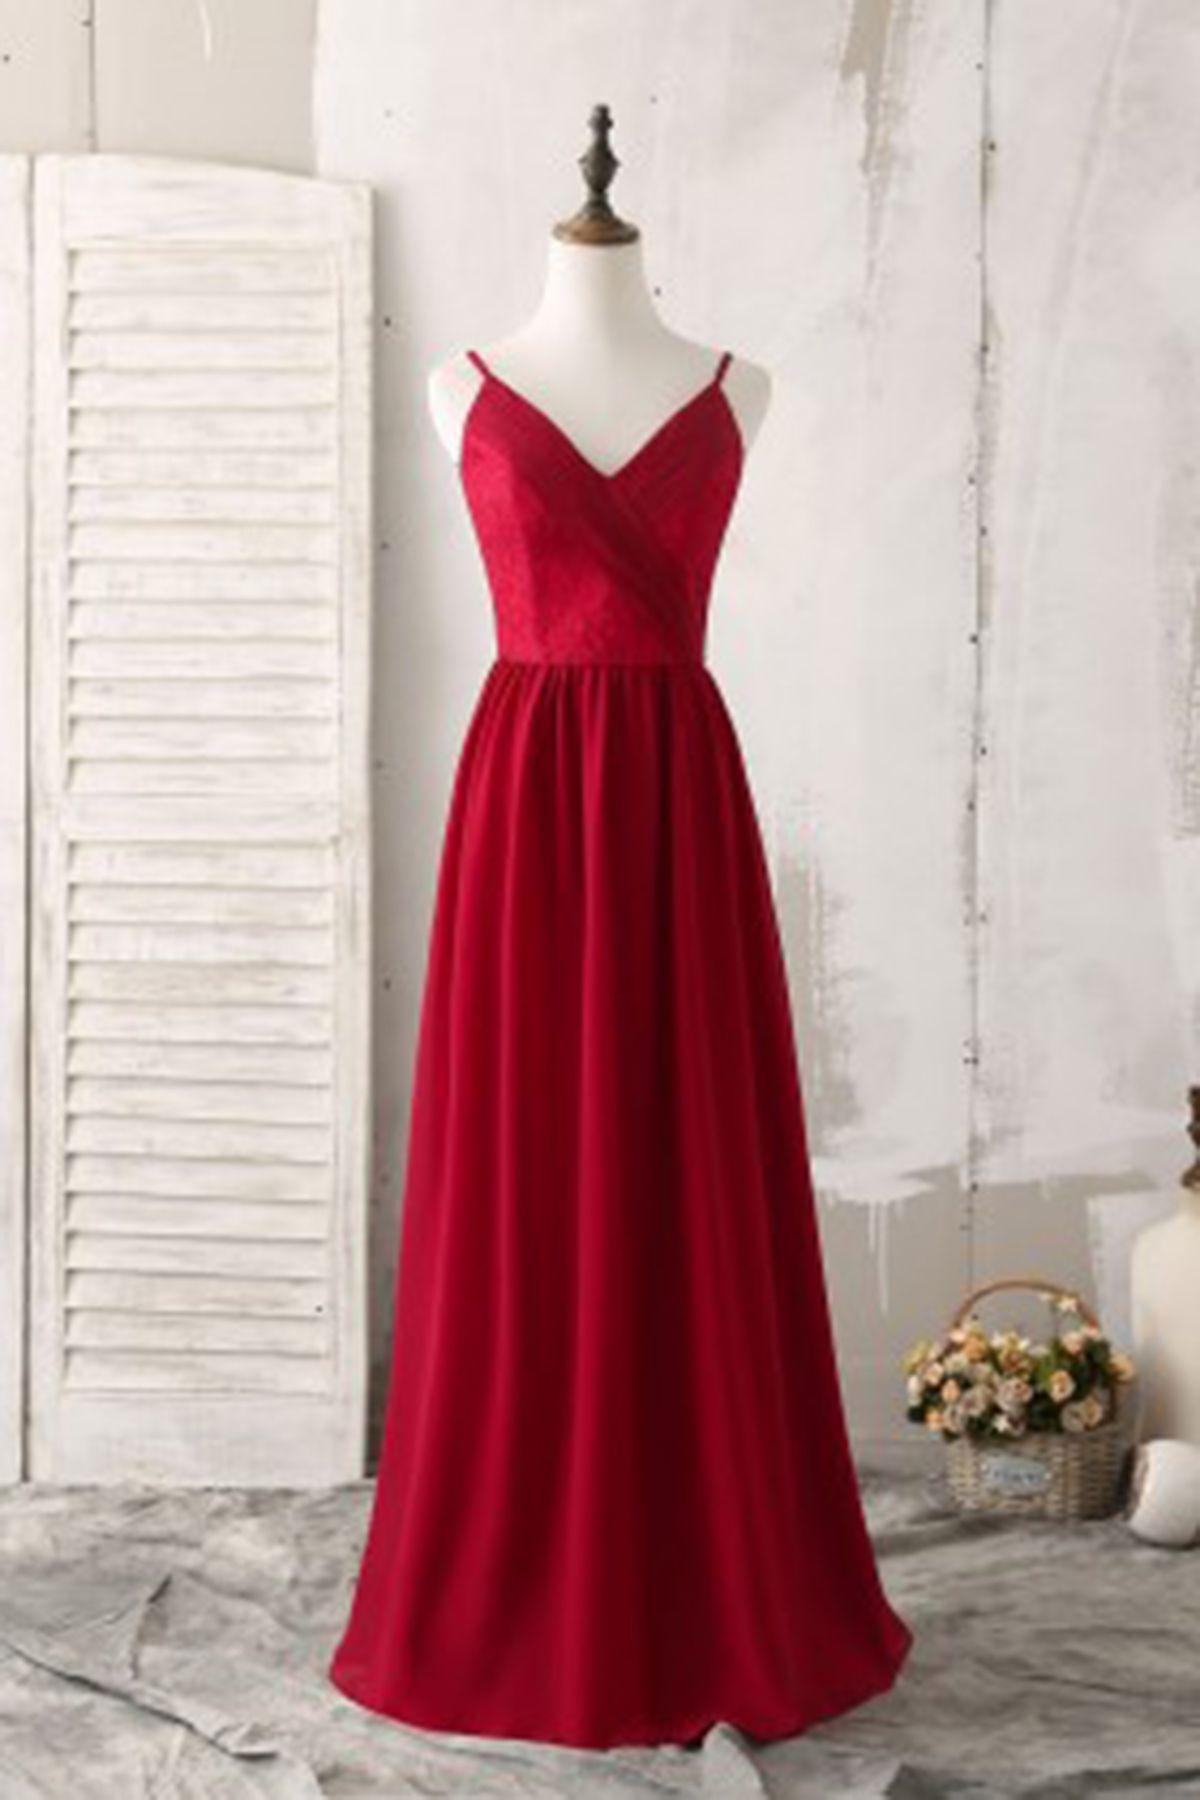 Simple burgundy v neck long prom dress long customize party dresses